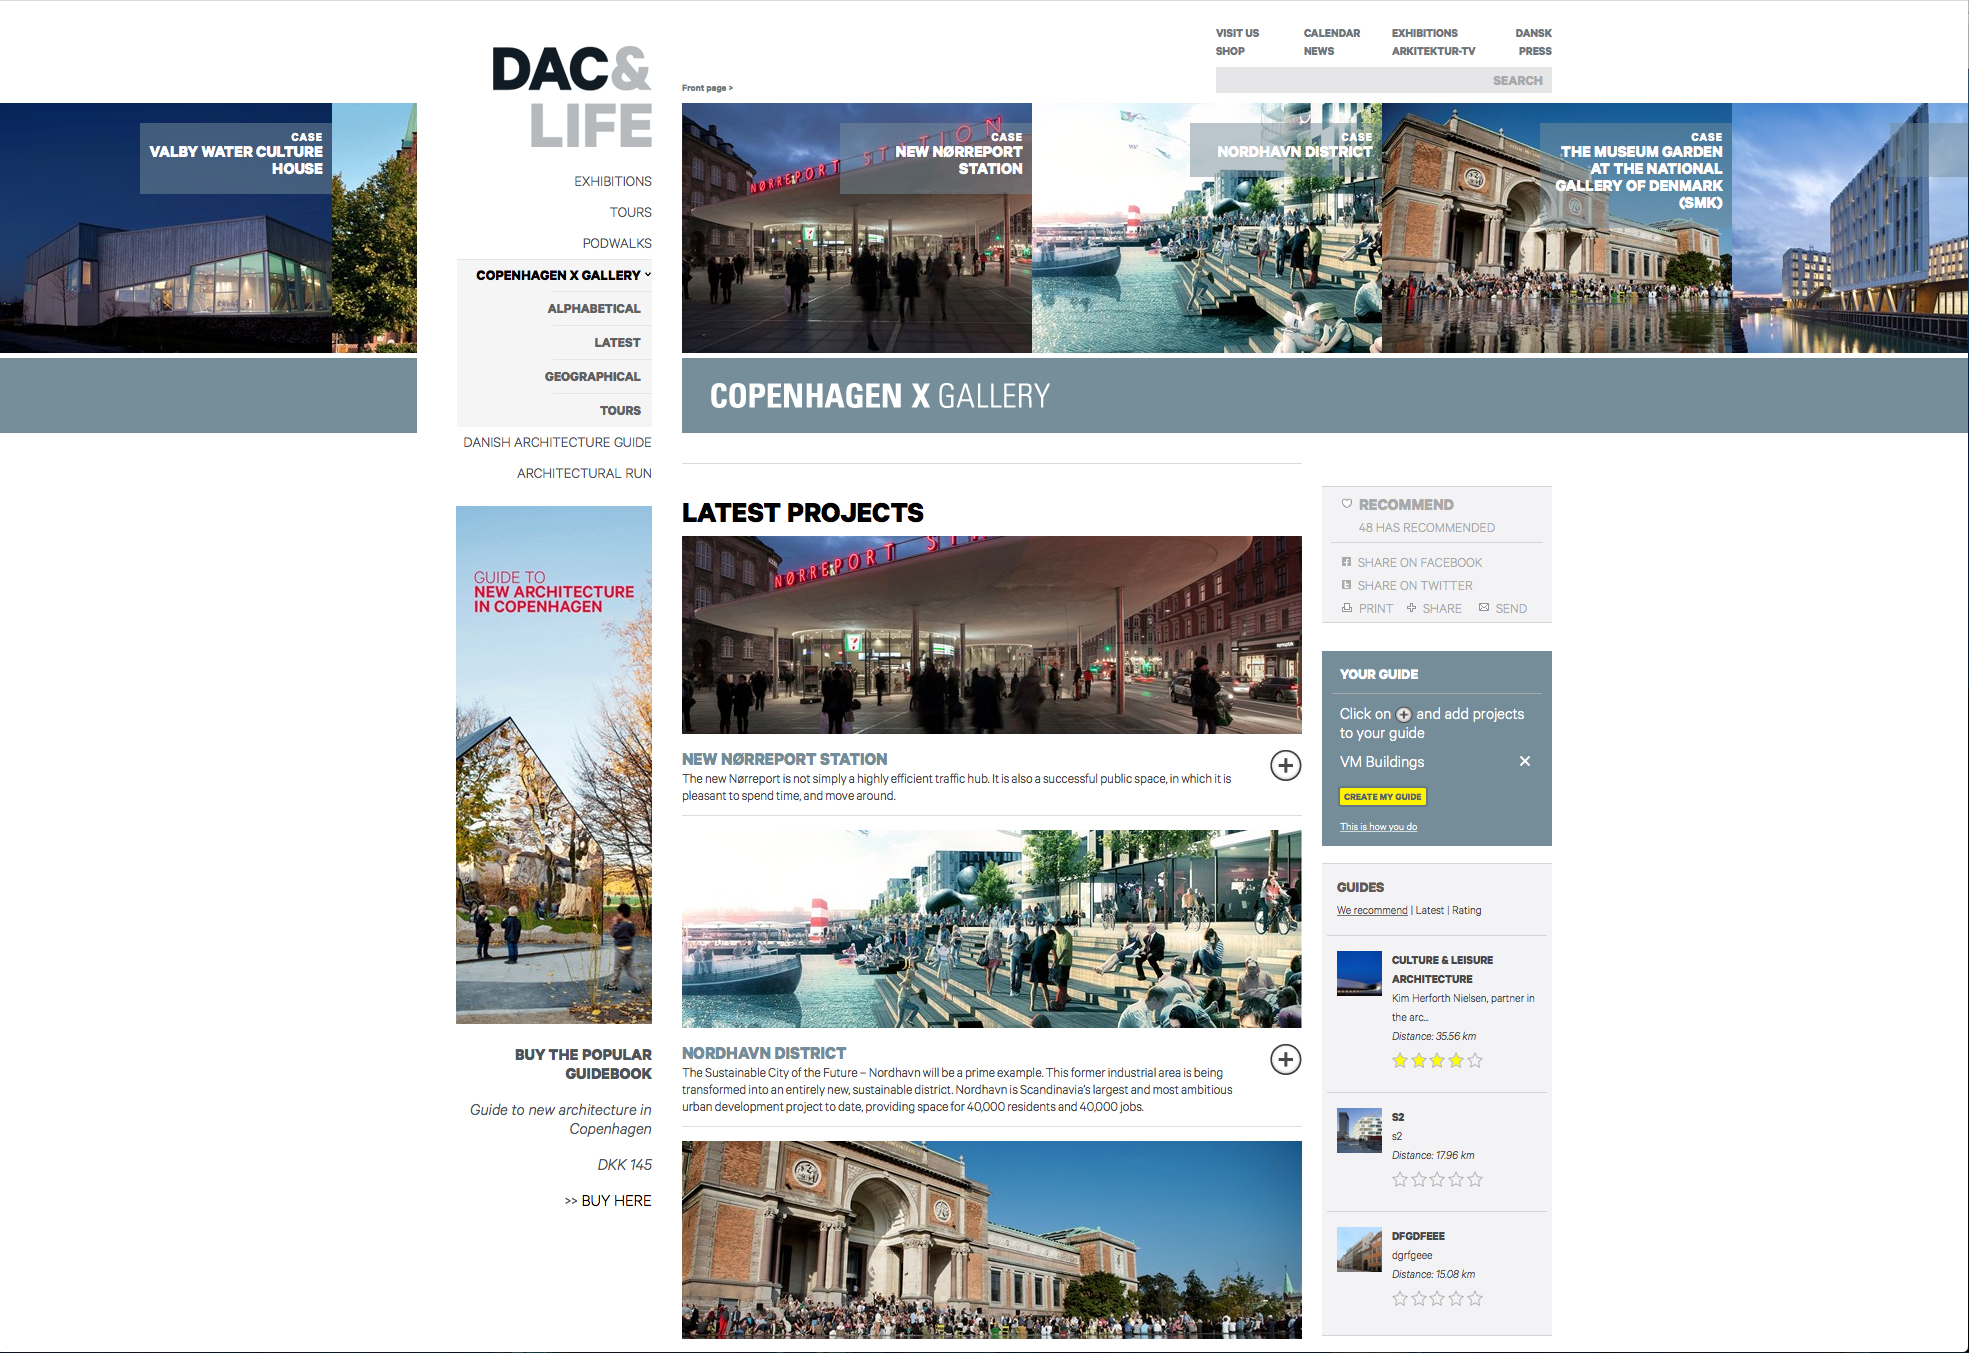 DAC site 3 copy.jpg